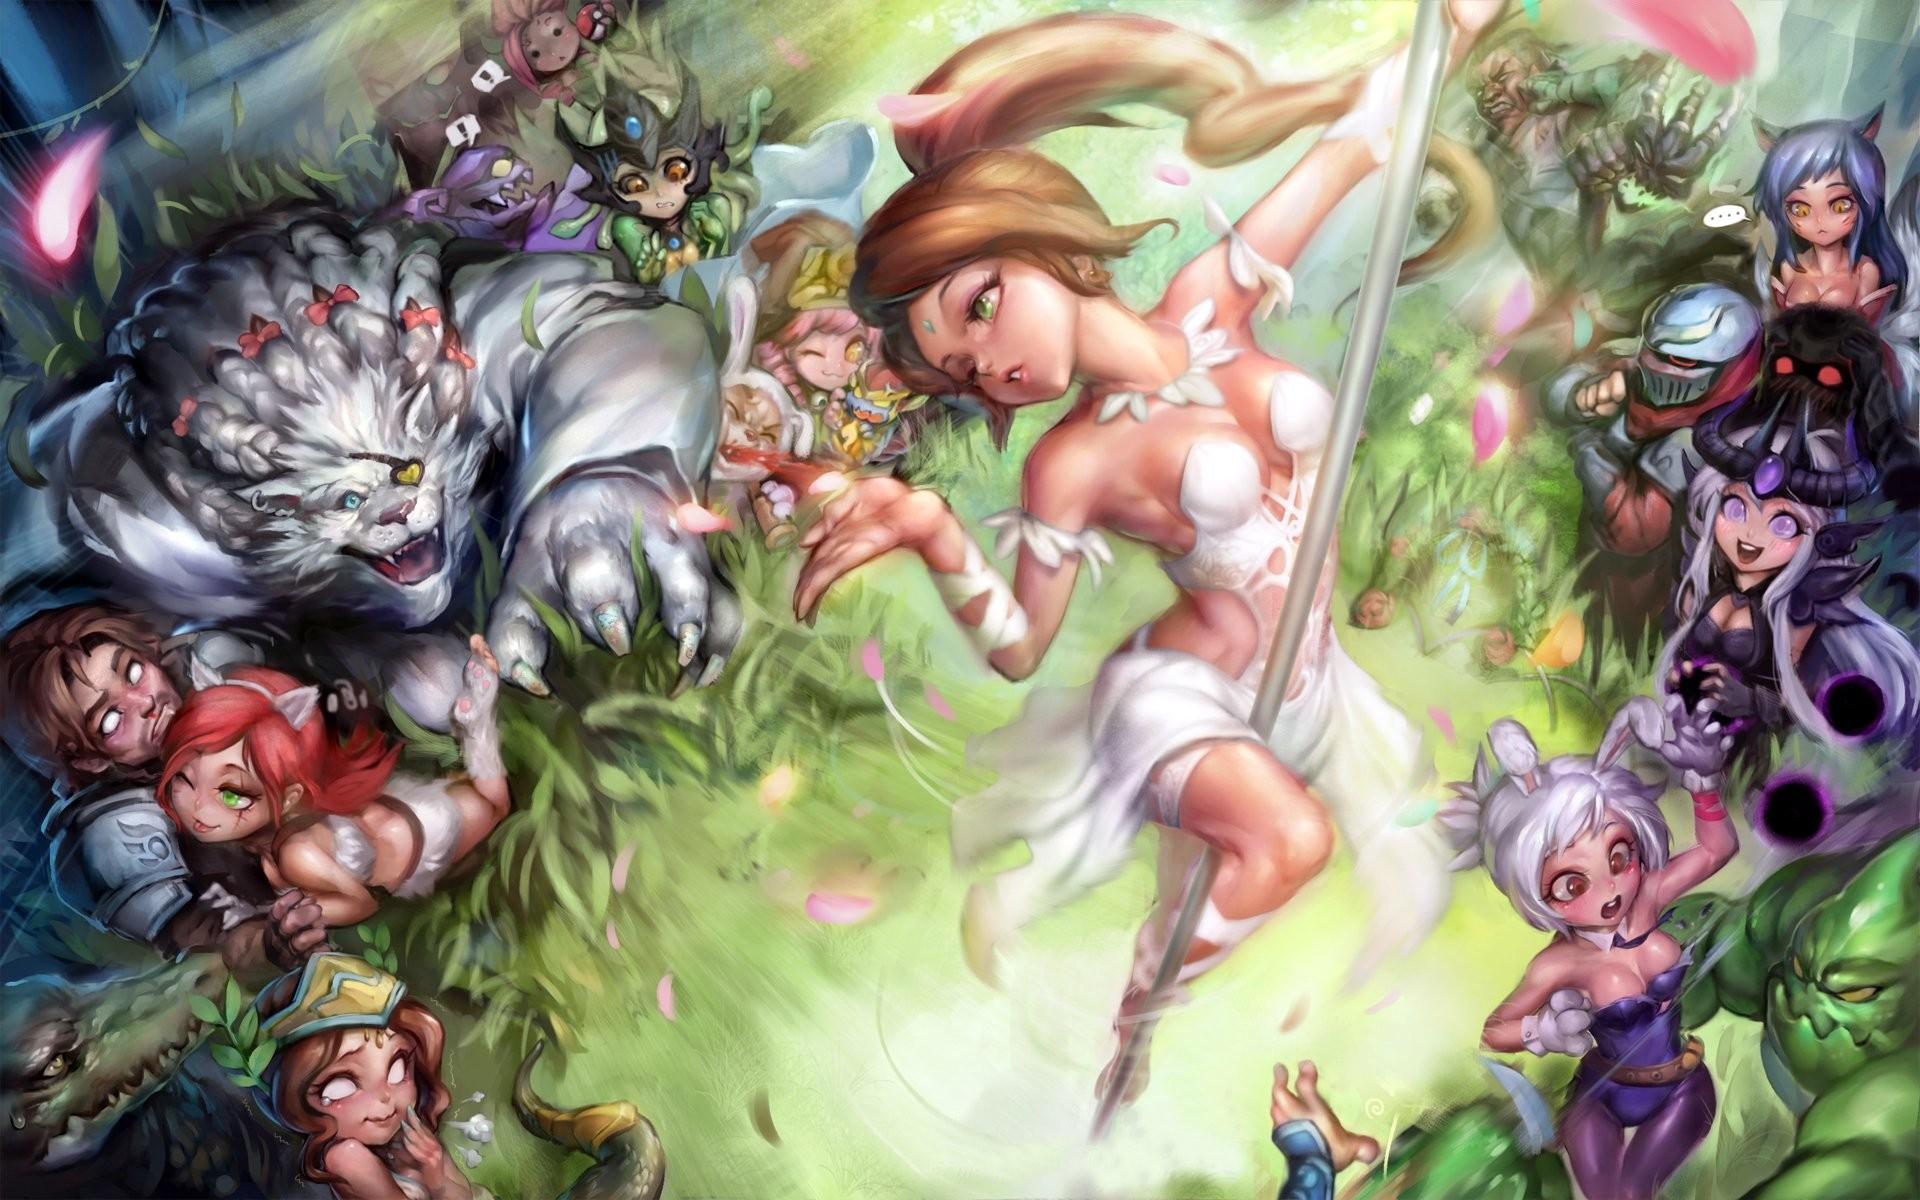 League of Legends Monster Warrior Ahri Nidalee Rengar Skarner Games Girls  Fantasy wallpaper